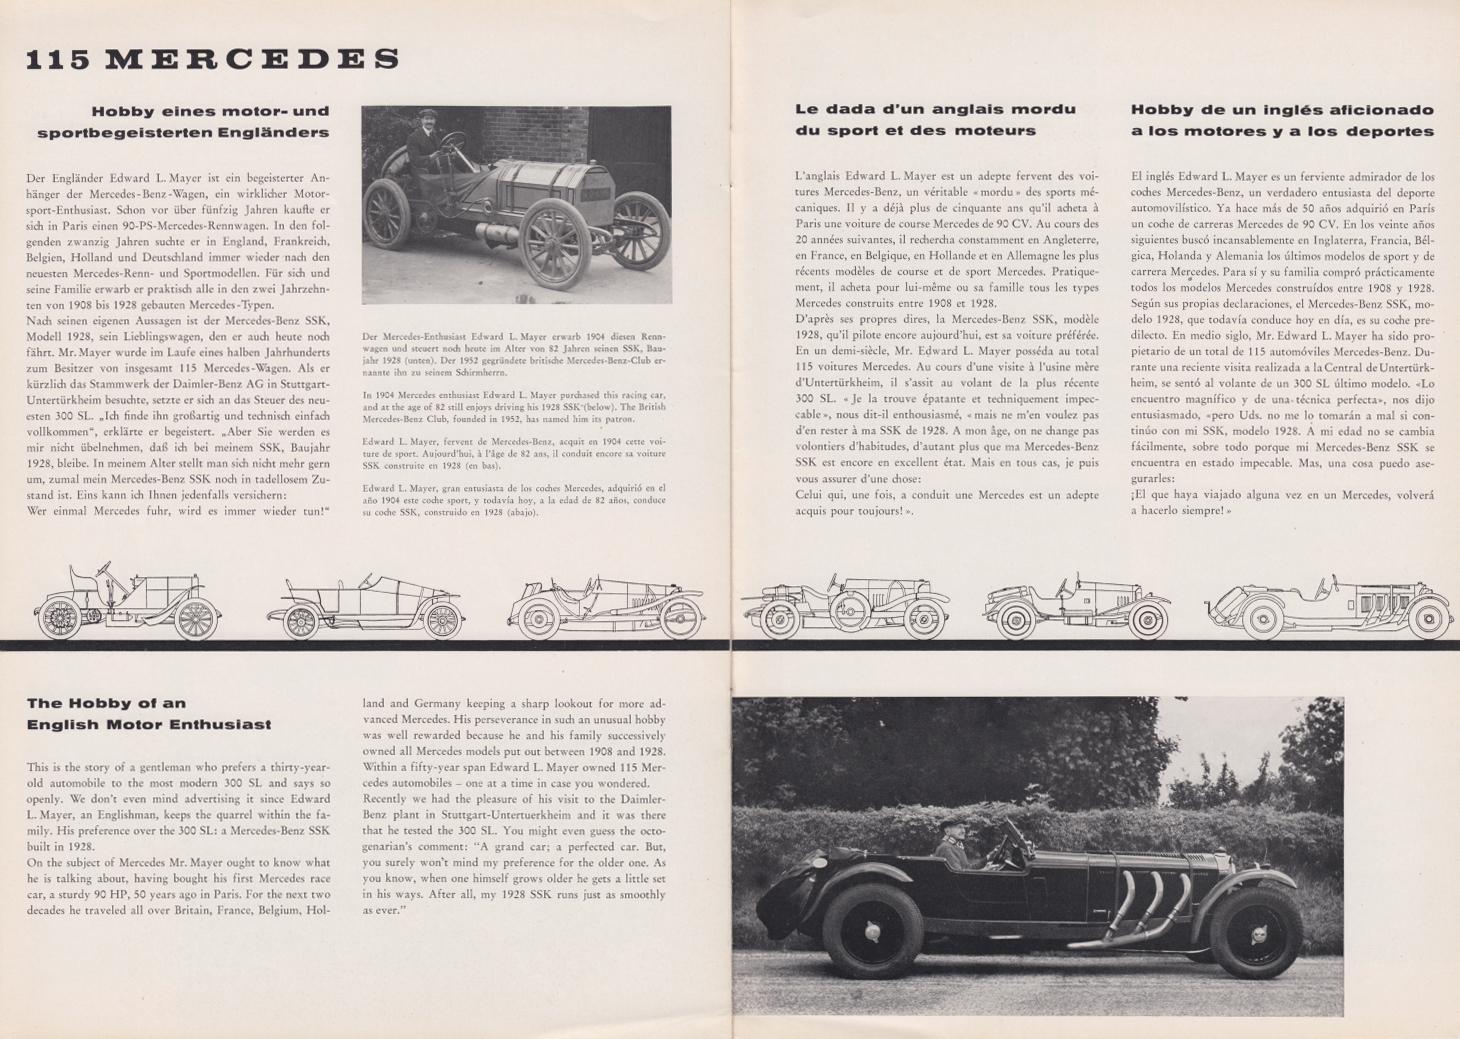 (REVISTA): Periódico In aller welt n.º 29 - Mercedes-Benz no mundo - 1959 - multilingue 010